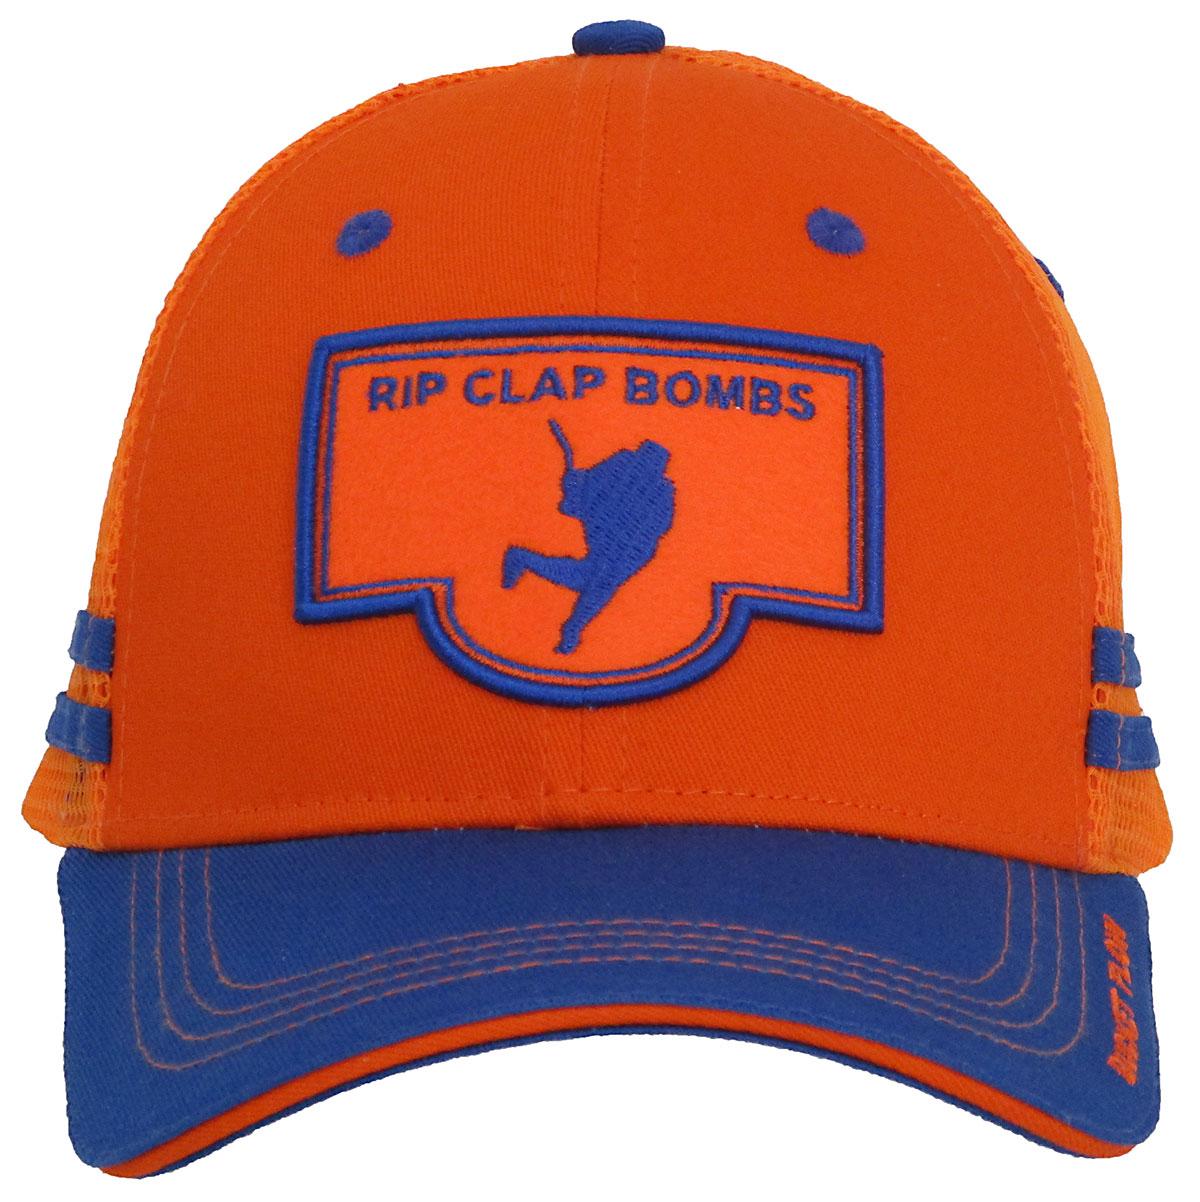 Clap Bombs